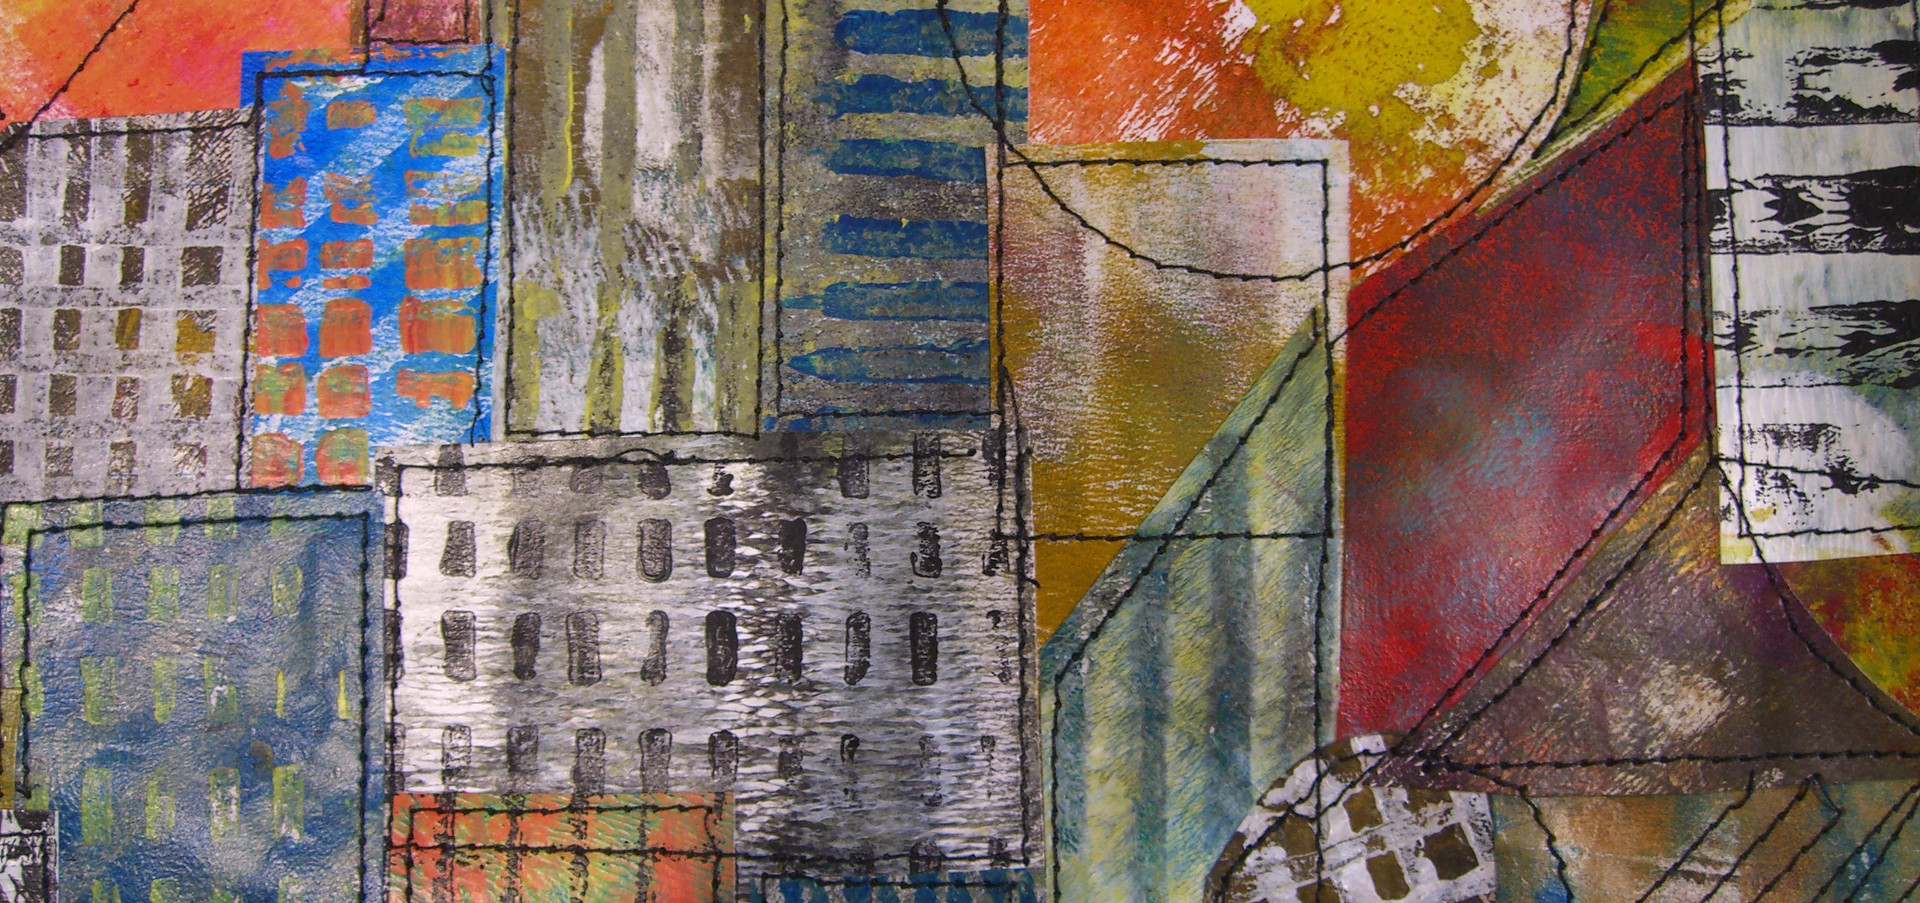 Painted Paper Quilt #2 (Detail)